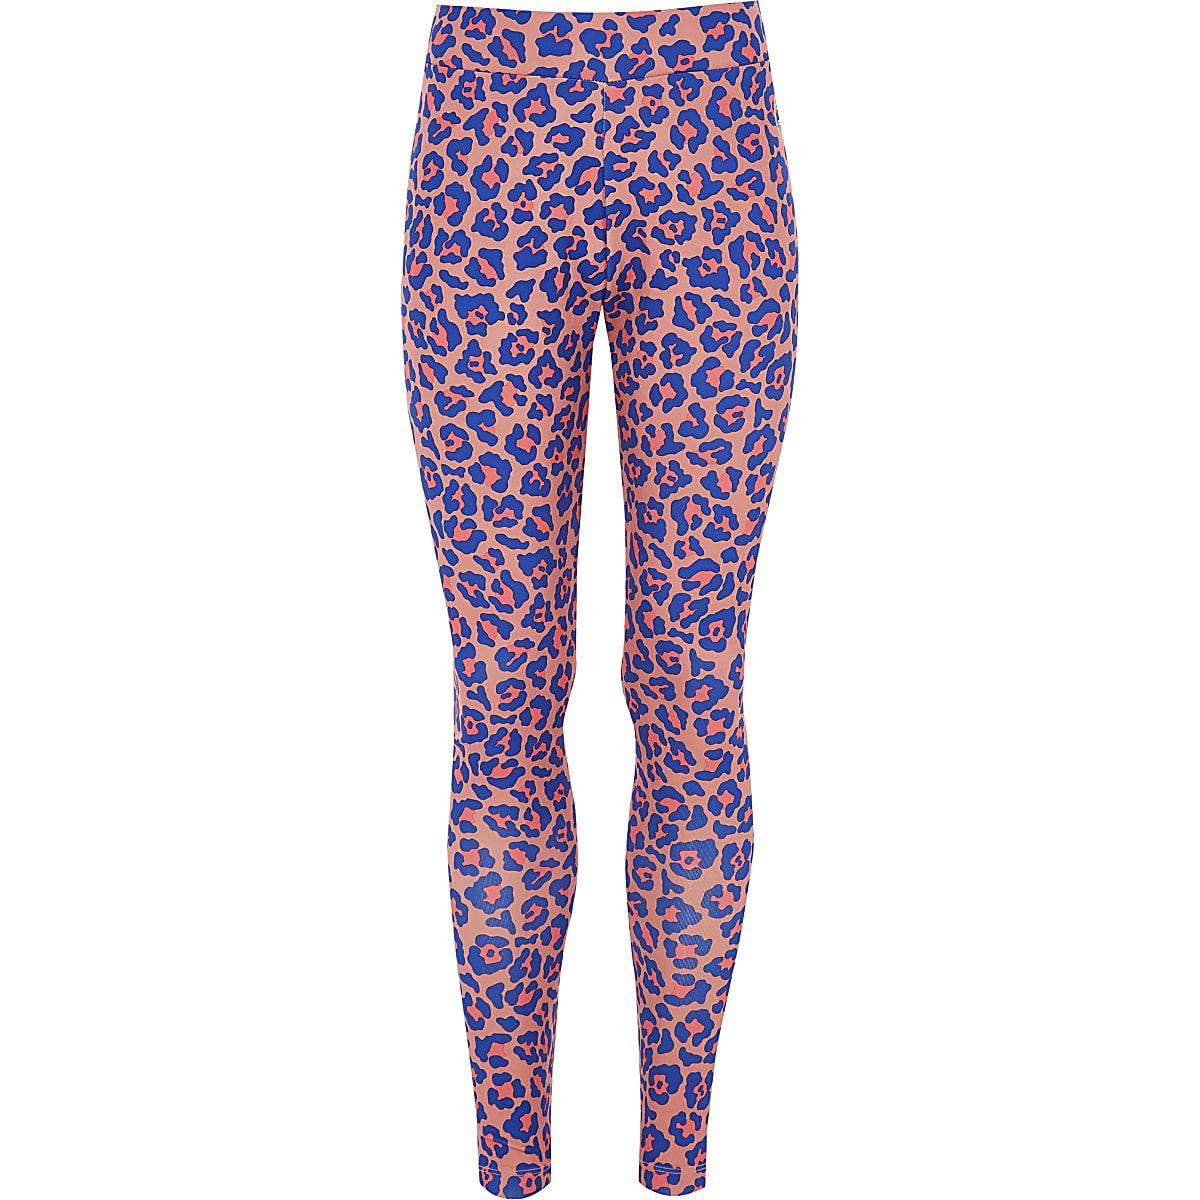 10566c7b67269 Girls Converse pink leopard print leggings Girls Converse pink leopard  print leggings ...